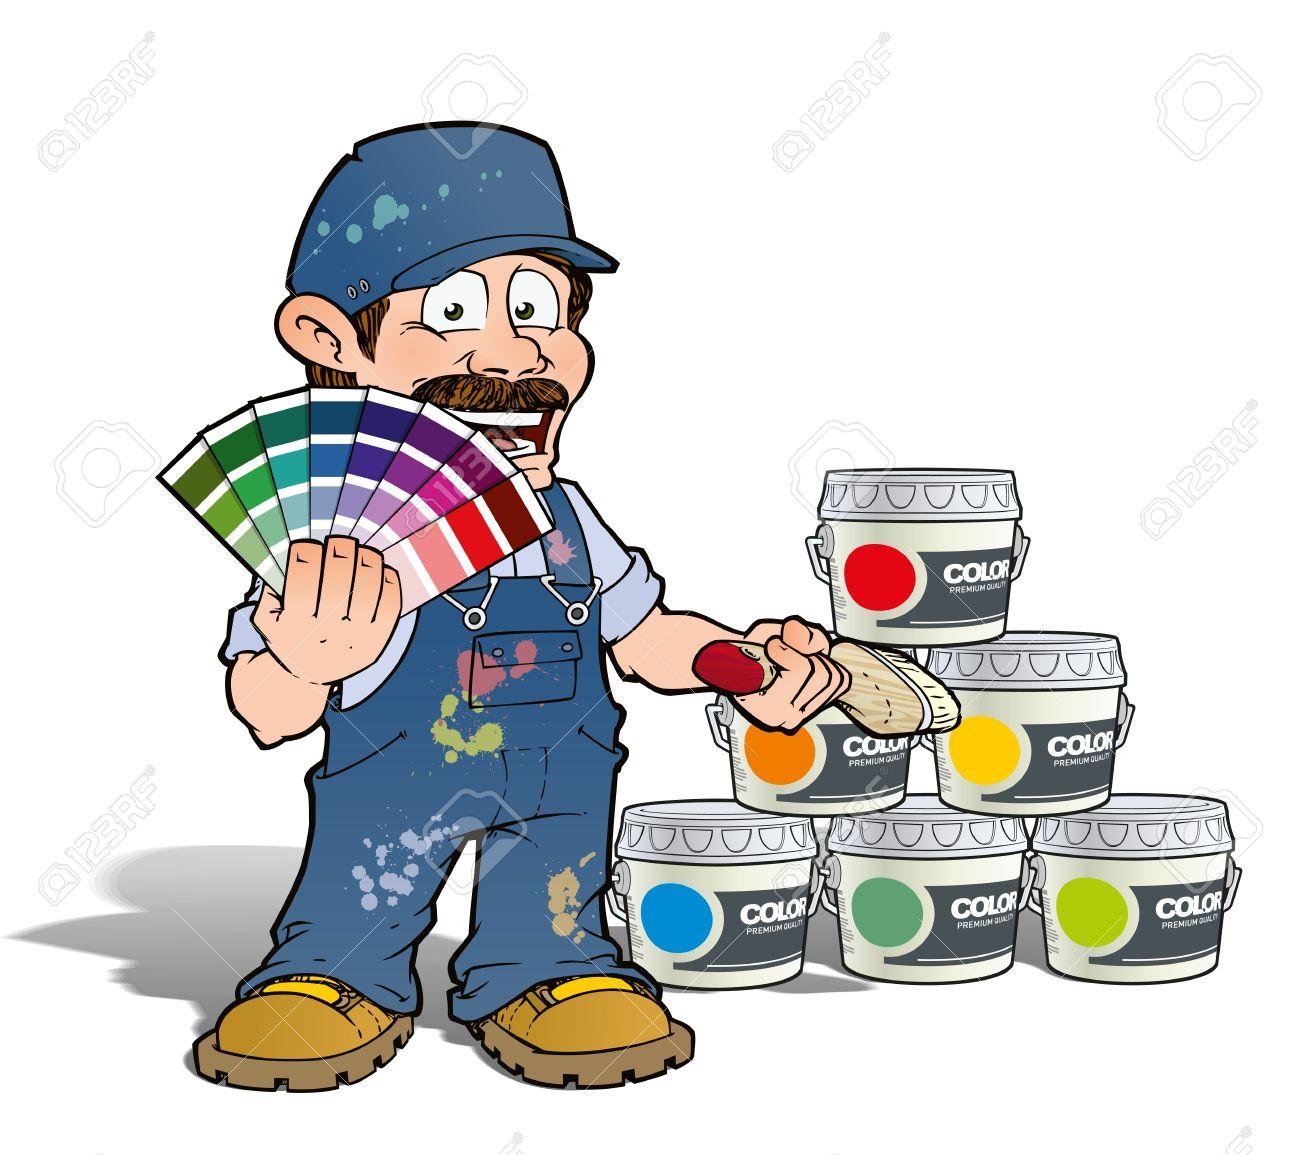 Handyman - Colour Picking Painter - blue